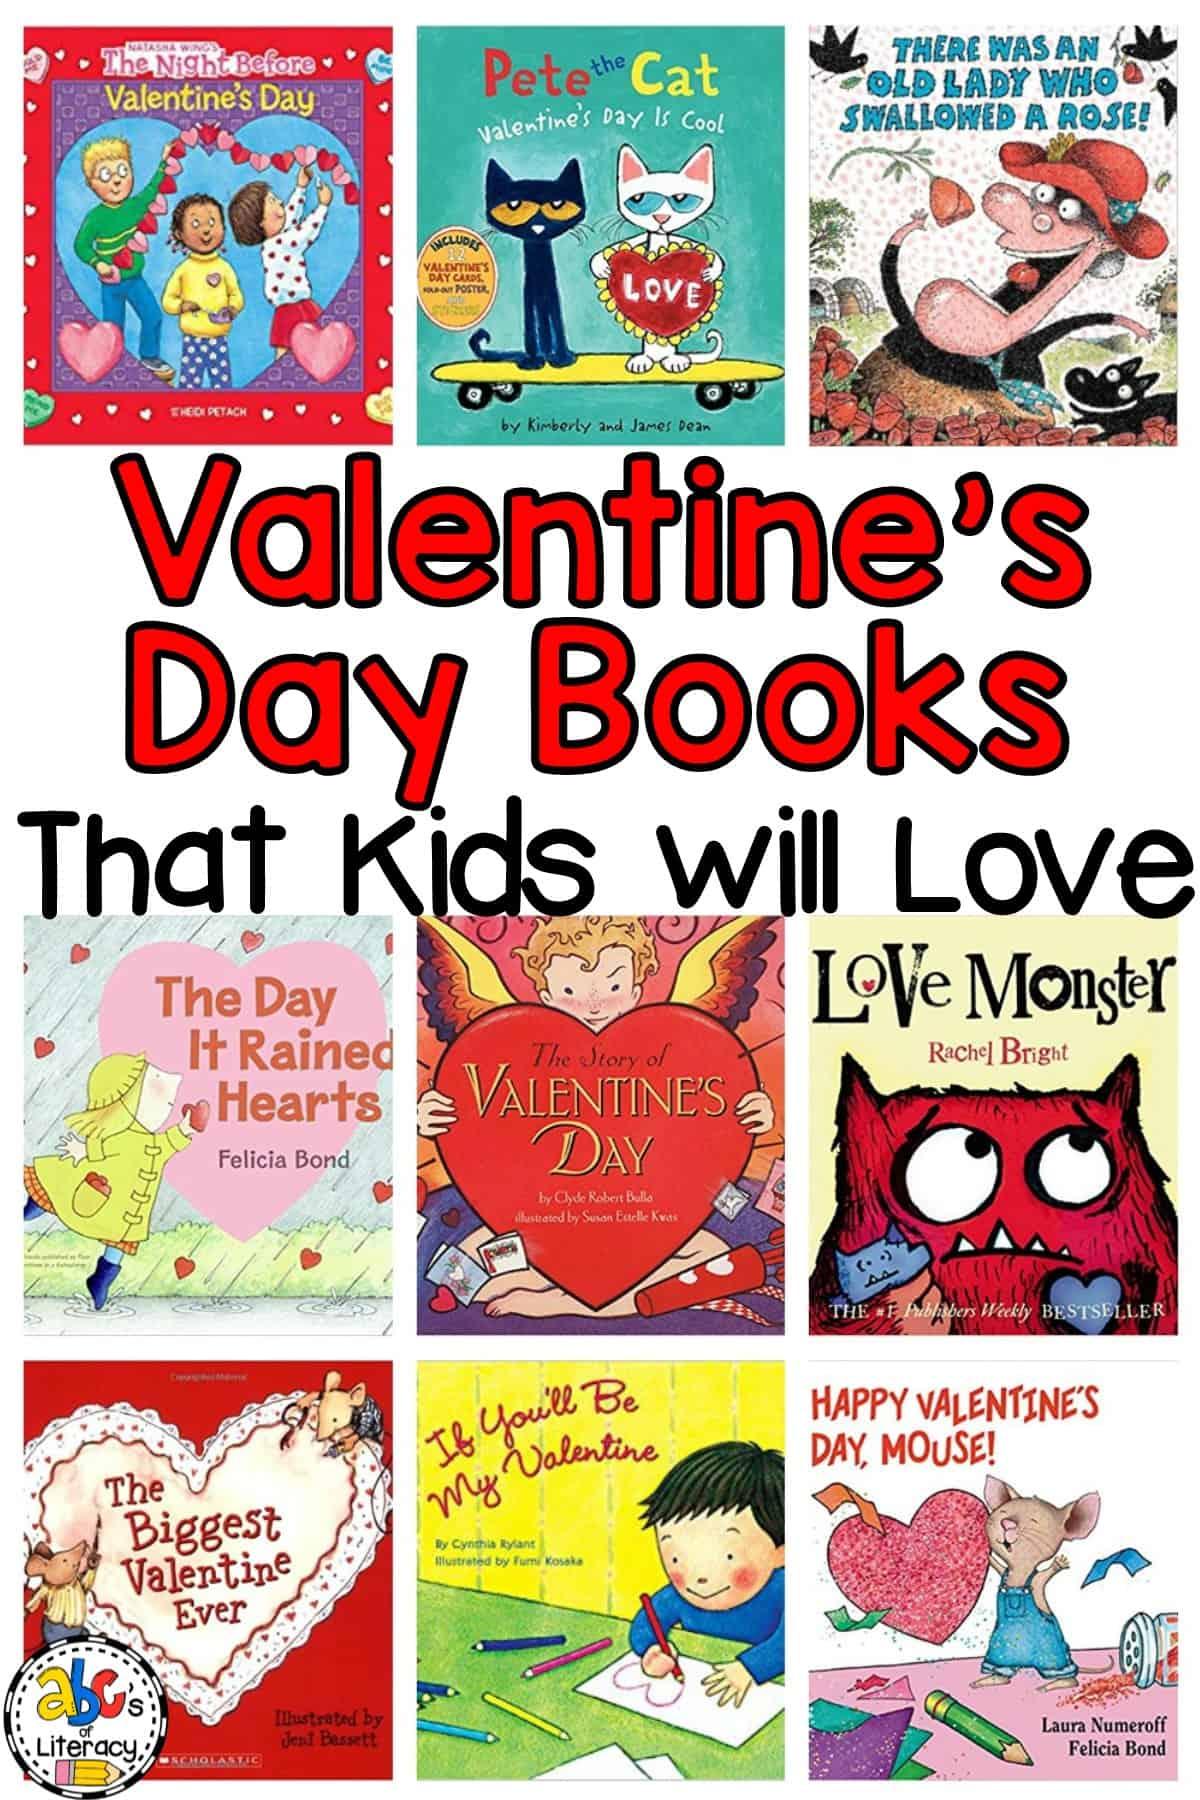 Valentine's Day Books That Kids Will Love, Valentine's Day Books, Valentines Day Books, Valentine Books